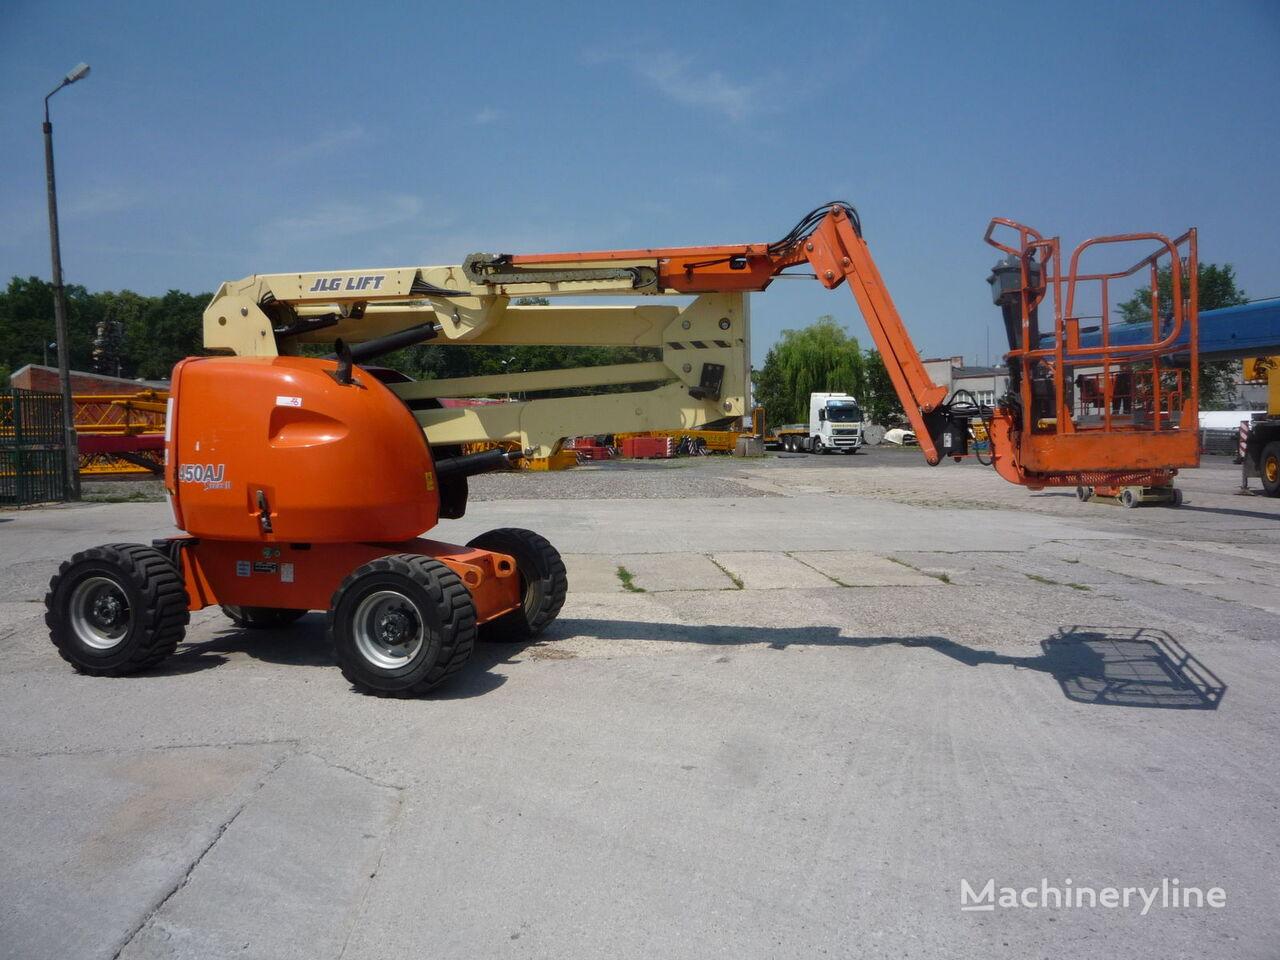 JLG 450AJ II nacelle articulée